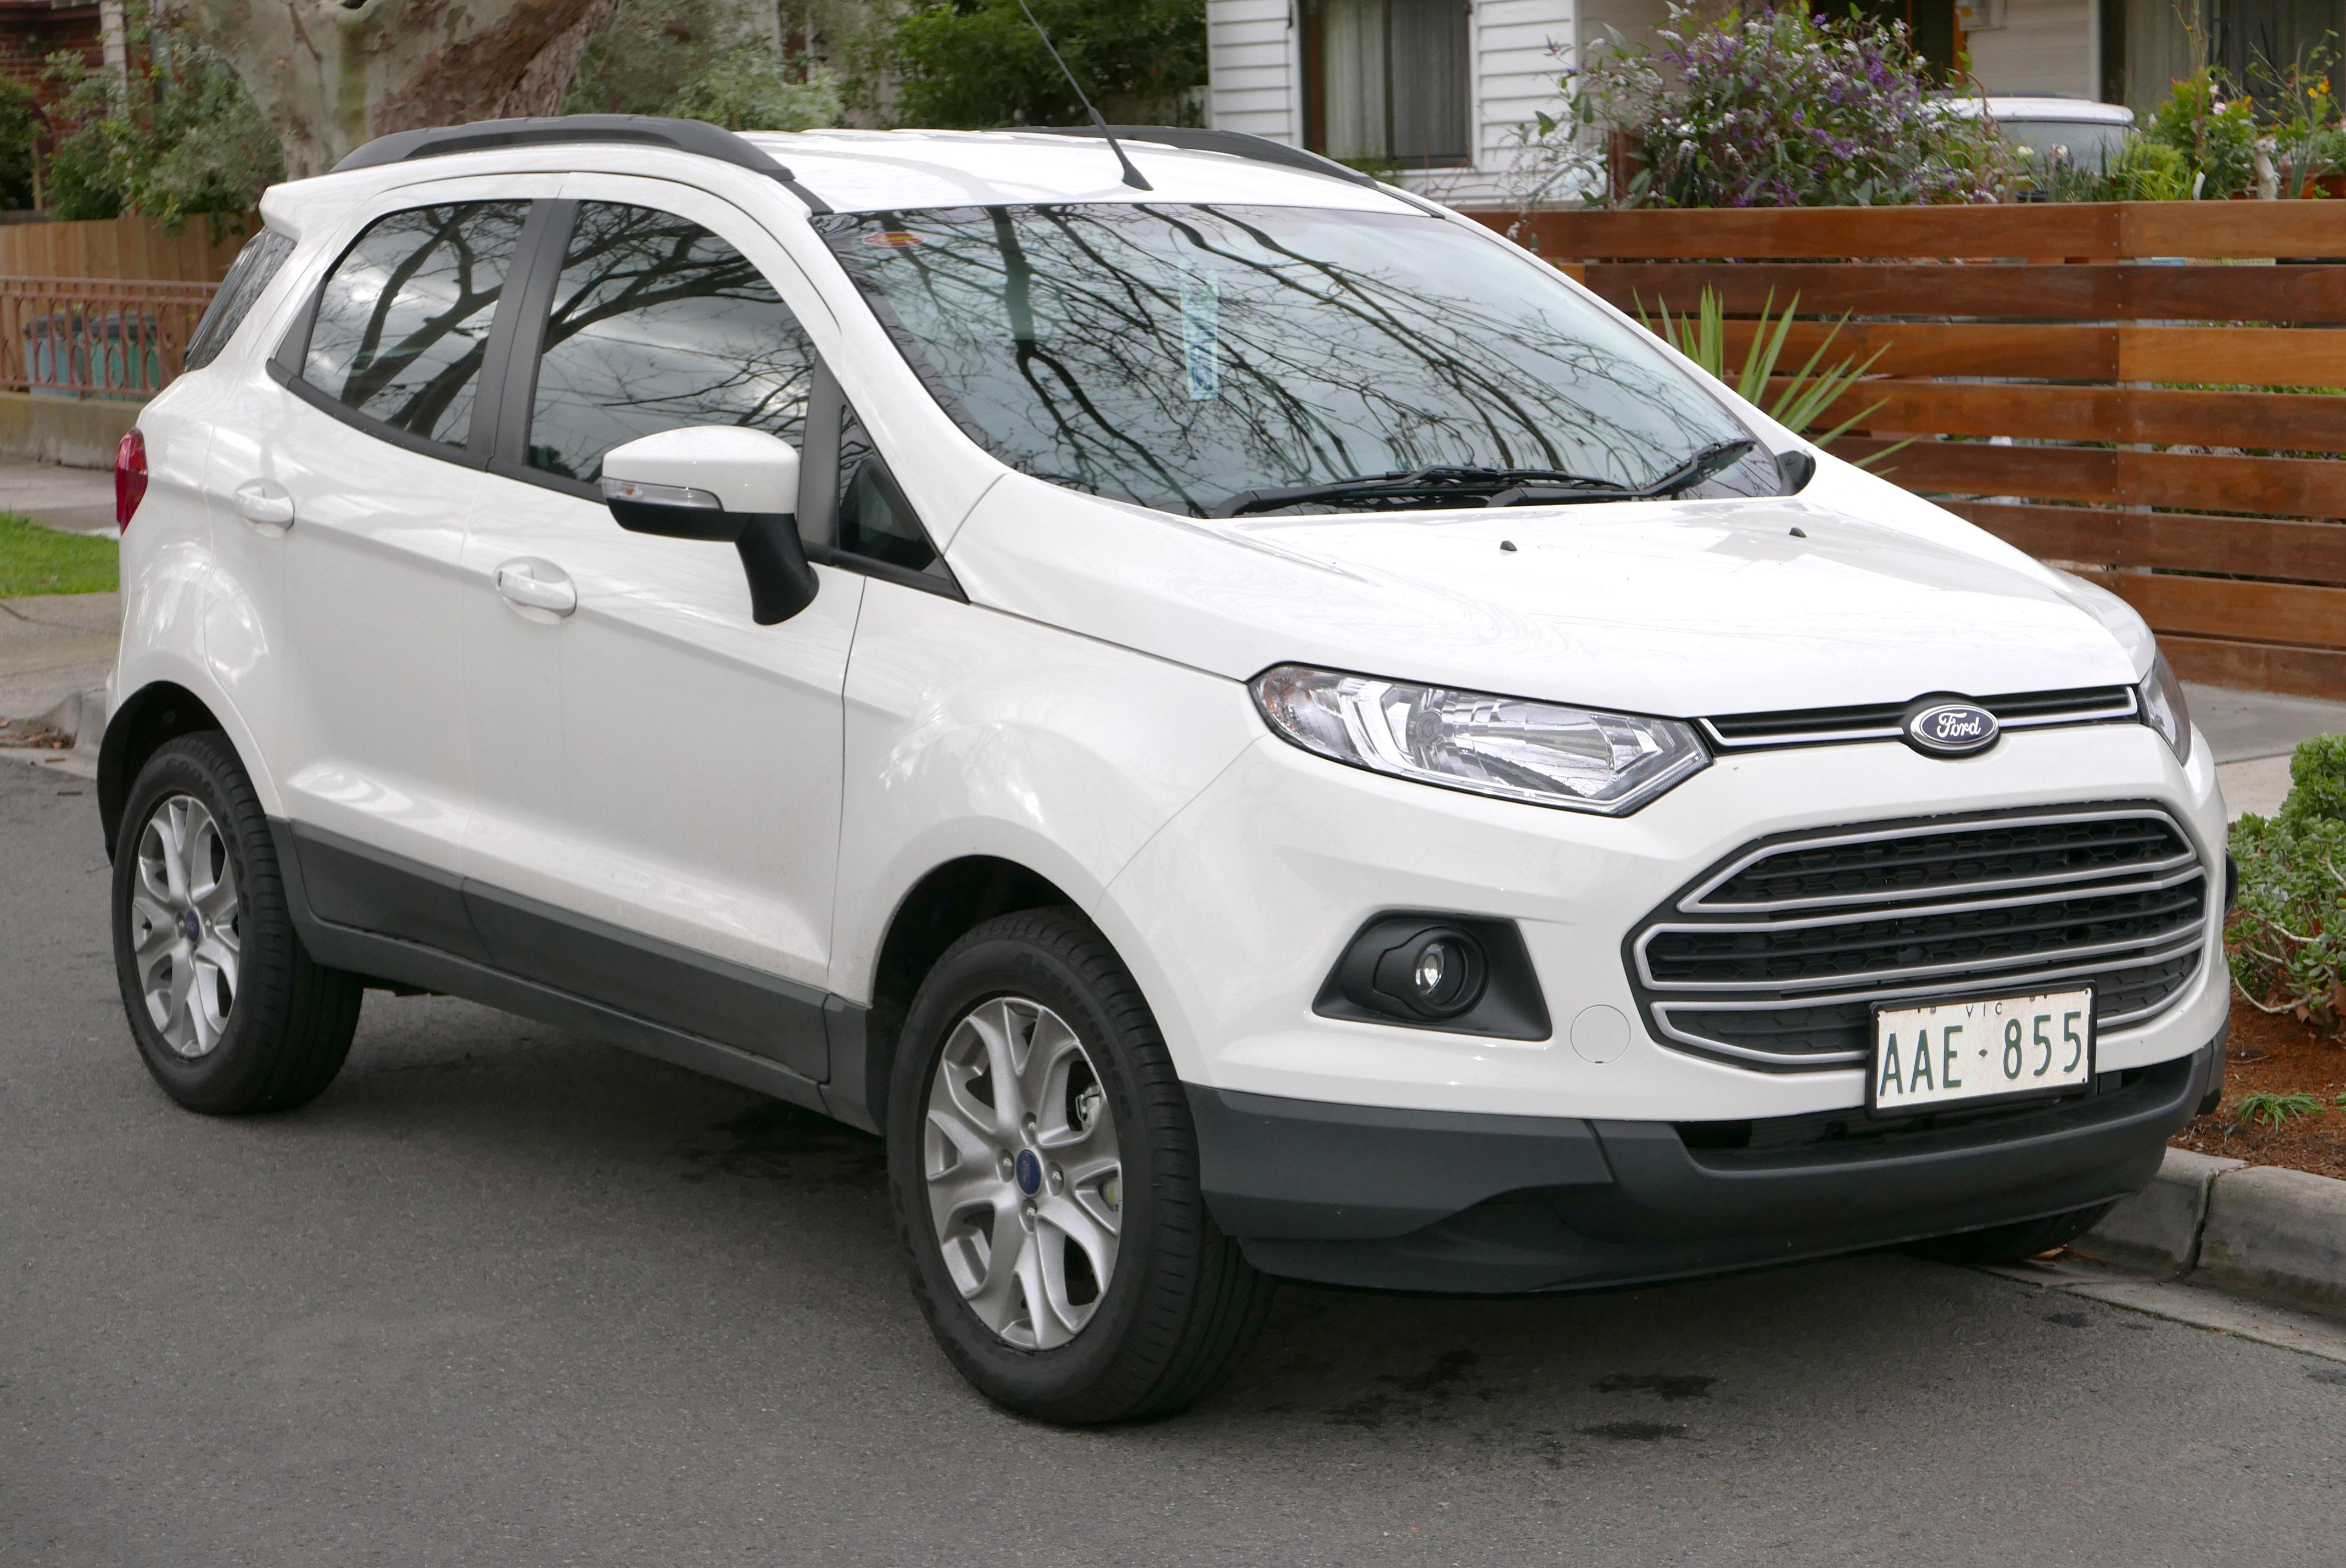 Image Result For Ford Kuga Problems